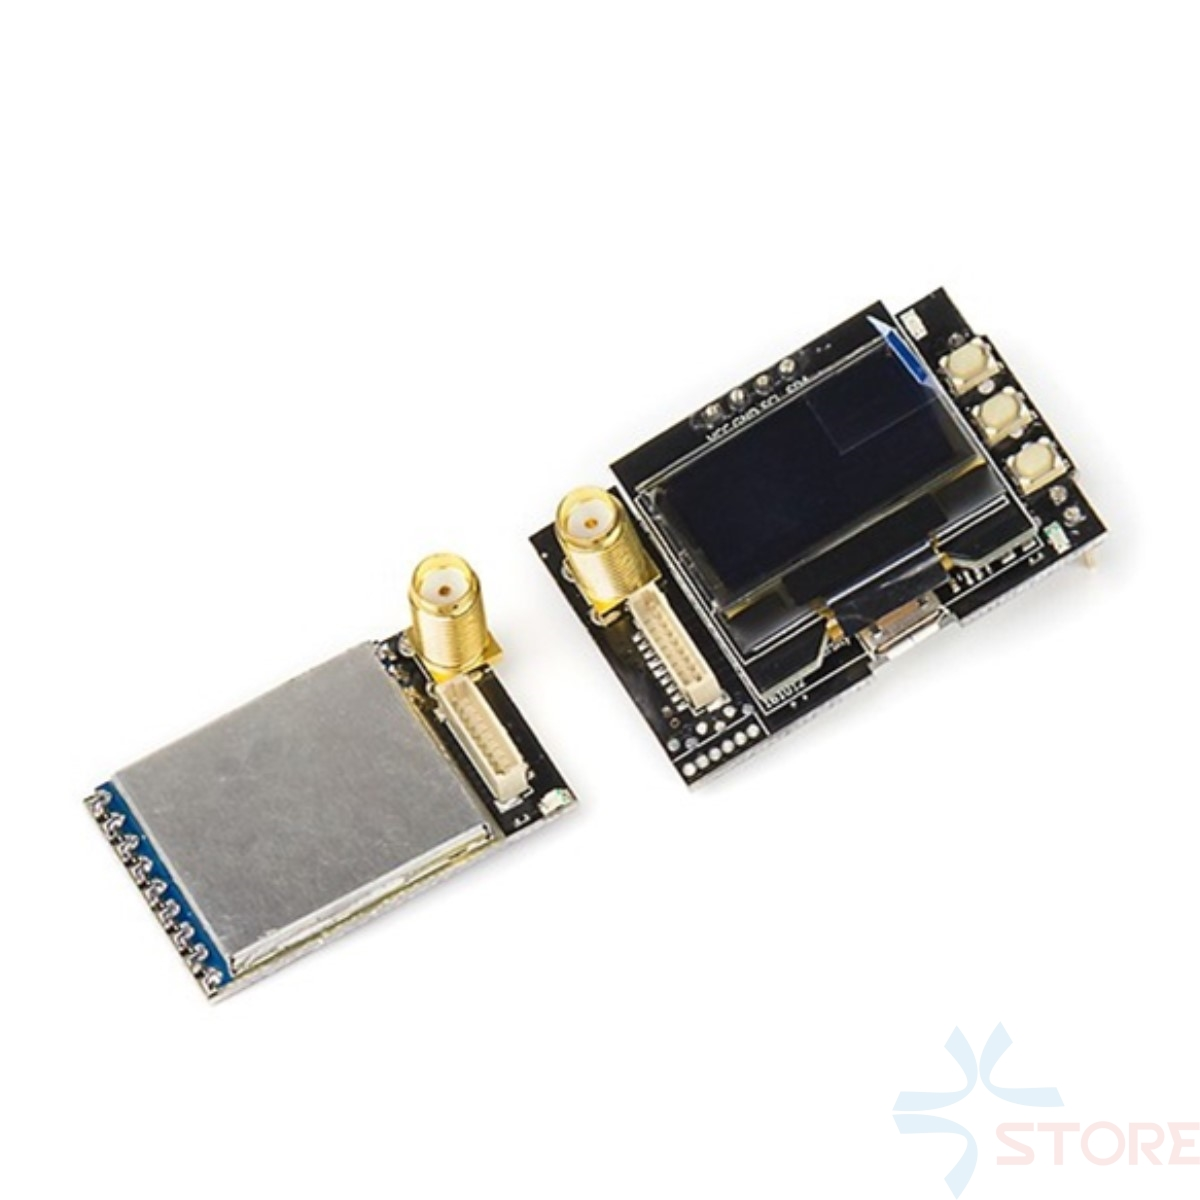 Fpvok HB5808 5.8 ГГц 40CH разнообразие приемник для Fatshark очки ж/raceband